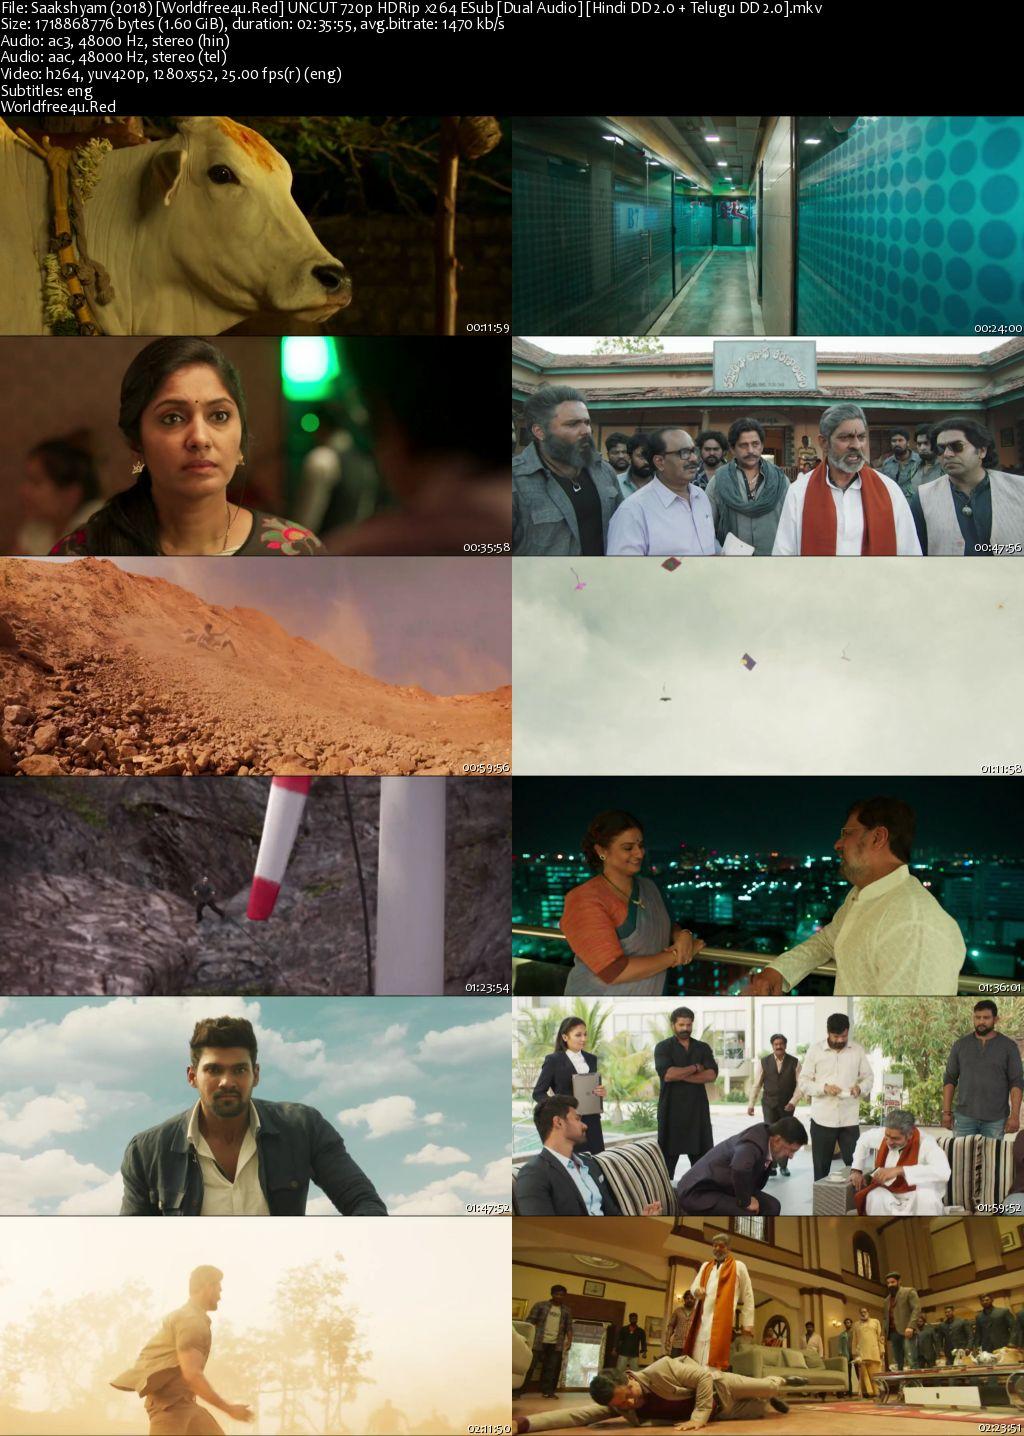 Saakshyam 2018 Hindi Dubbed HDRip 720p